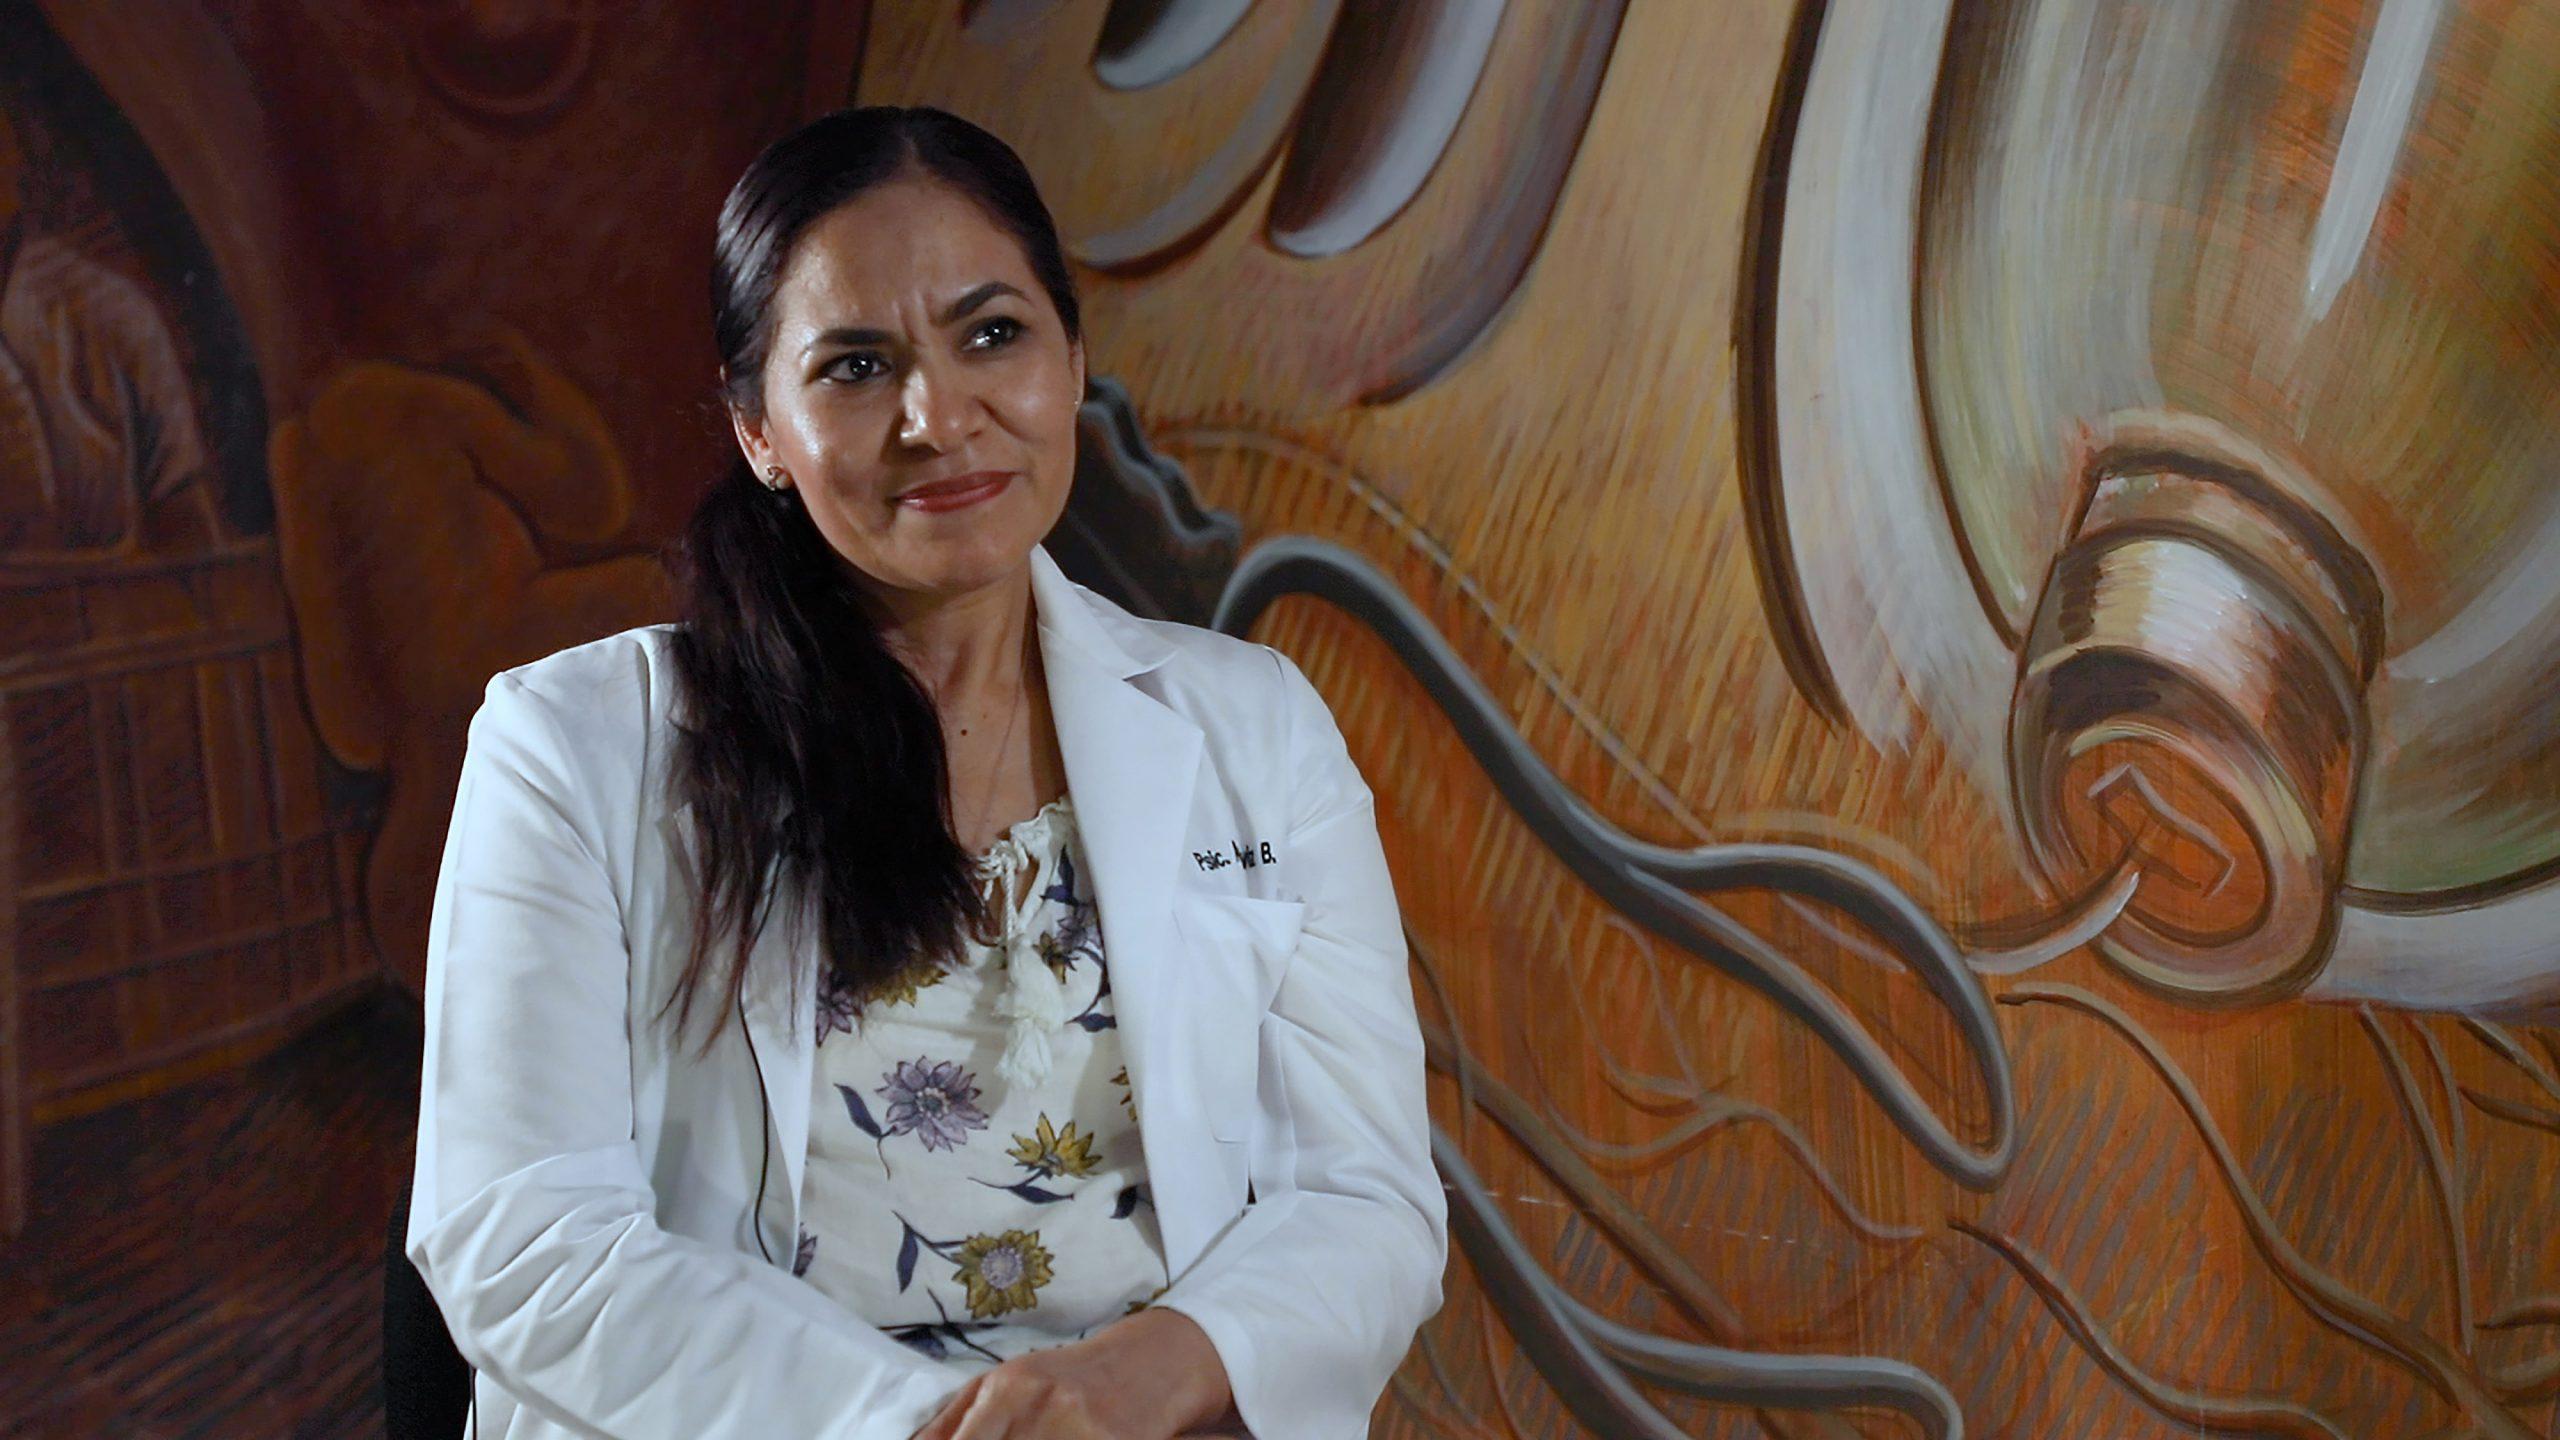 Psicóloga Ana Galaviz, especialista en salud mental